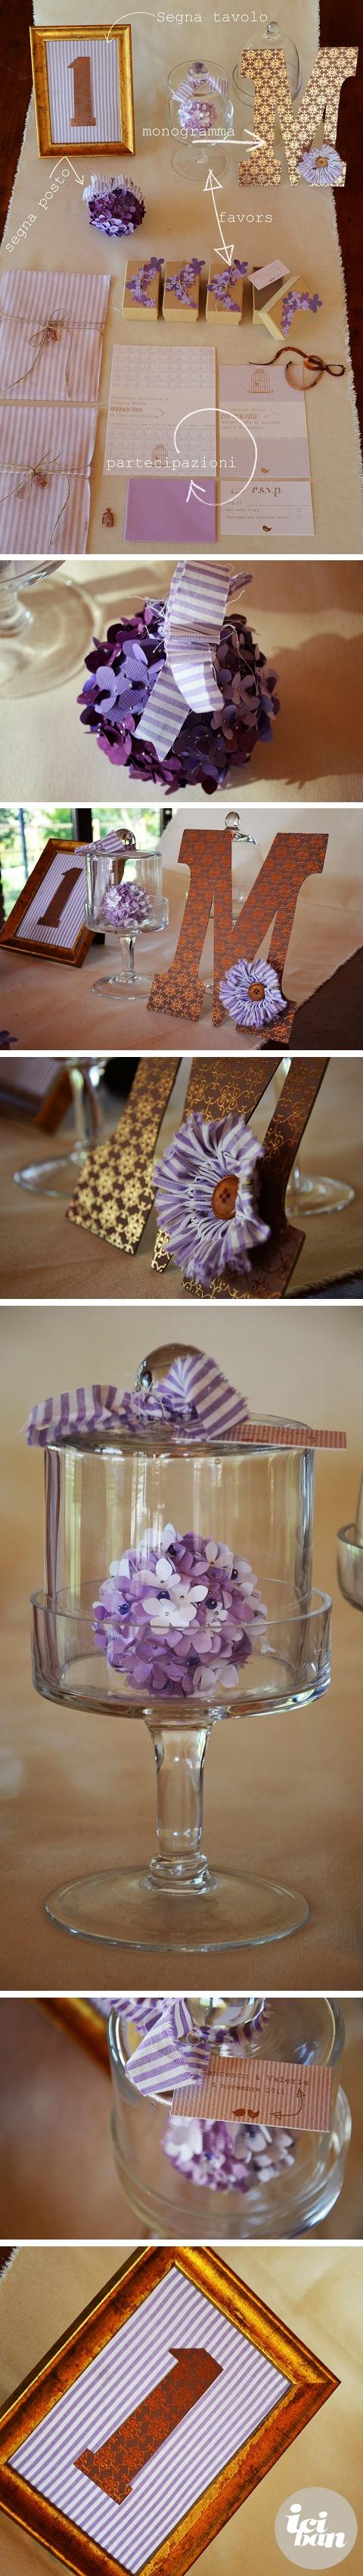 Wedding suite lavanda + bronzo by iciban